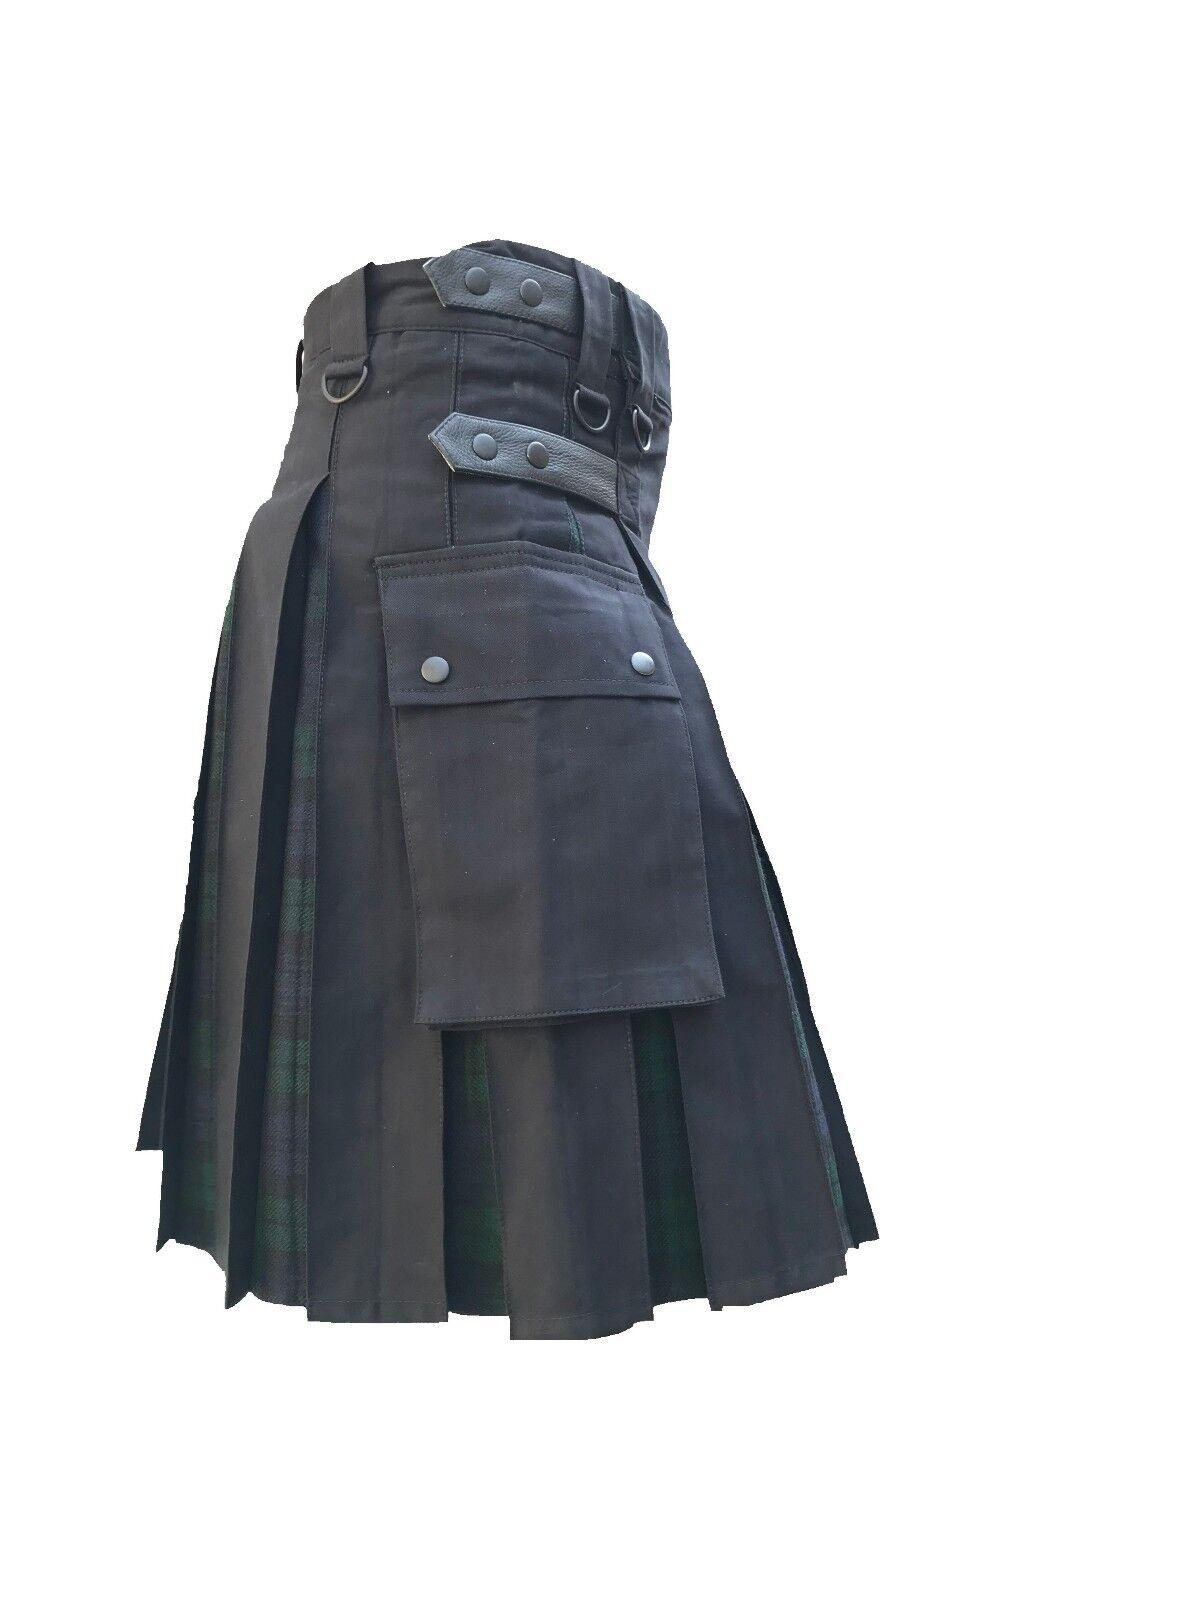 Men's Hybrid Black Cotton & Blackwatch Tartan Utility Kilt Leather Straps